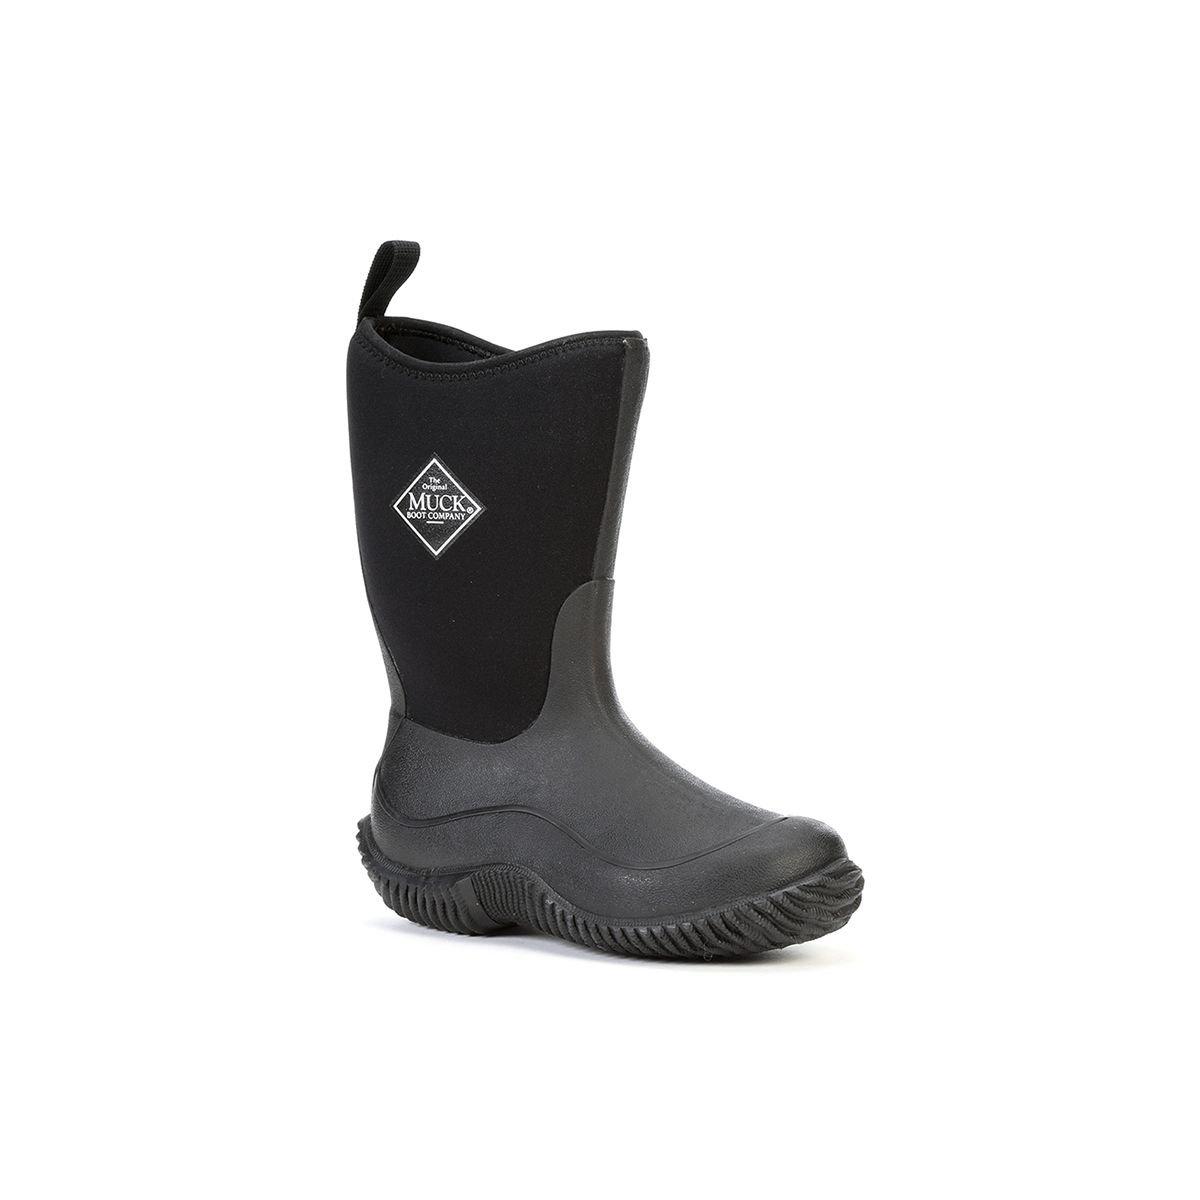 Muck Boot Hale Boot, Black/Black, 7 M US Toddler